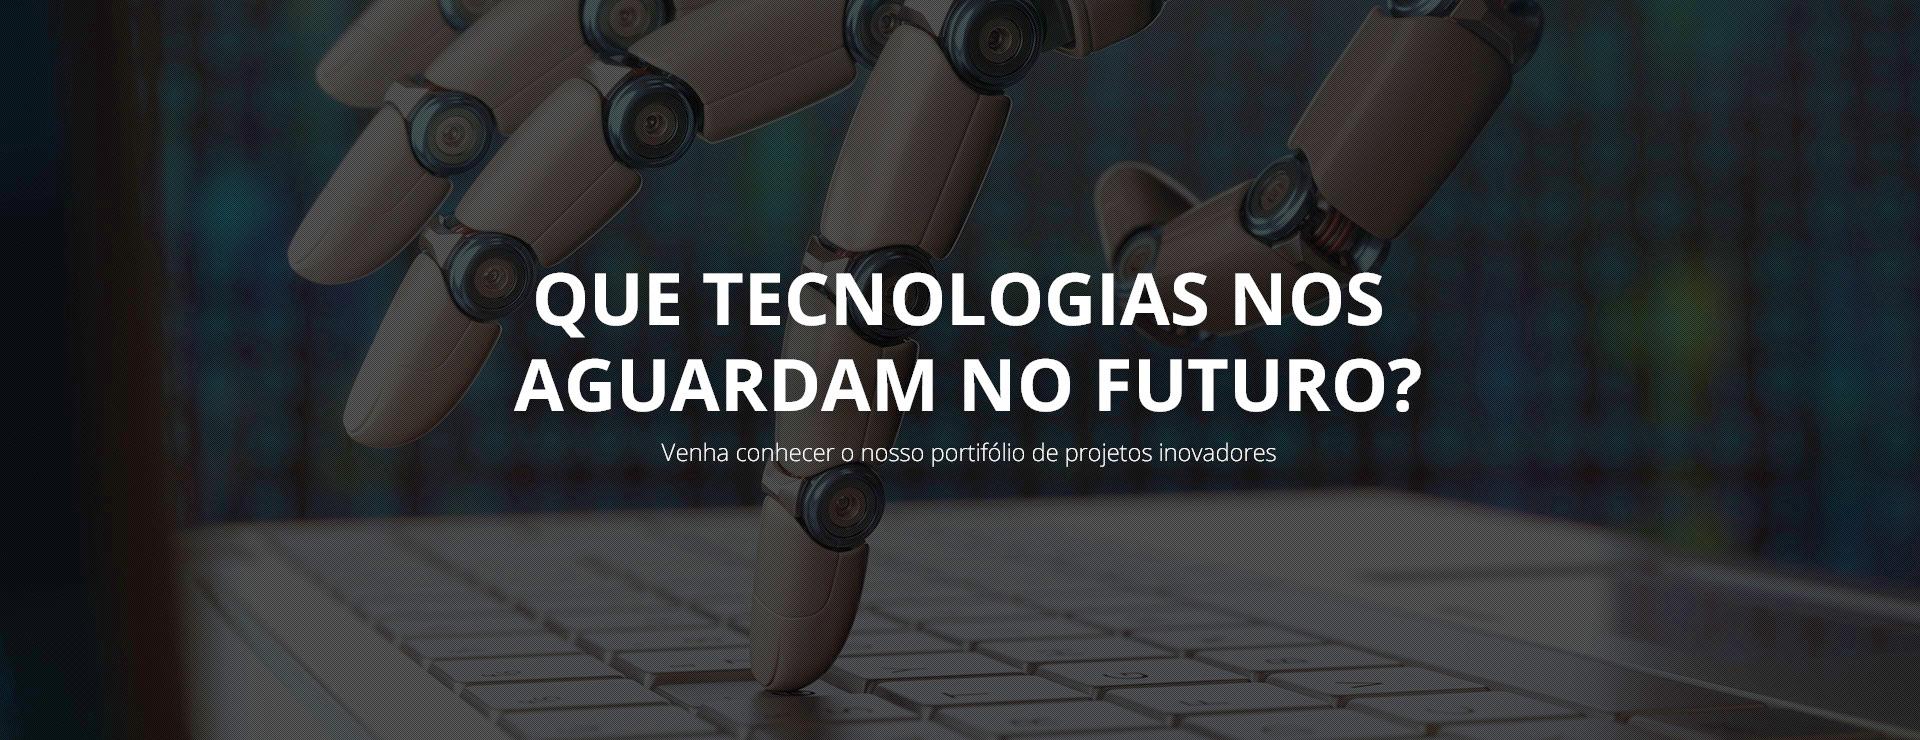 Tecnologias do Futuro